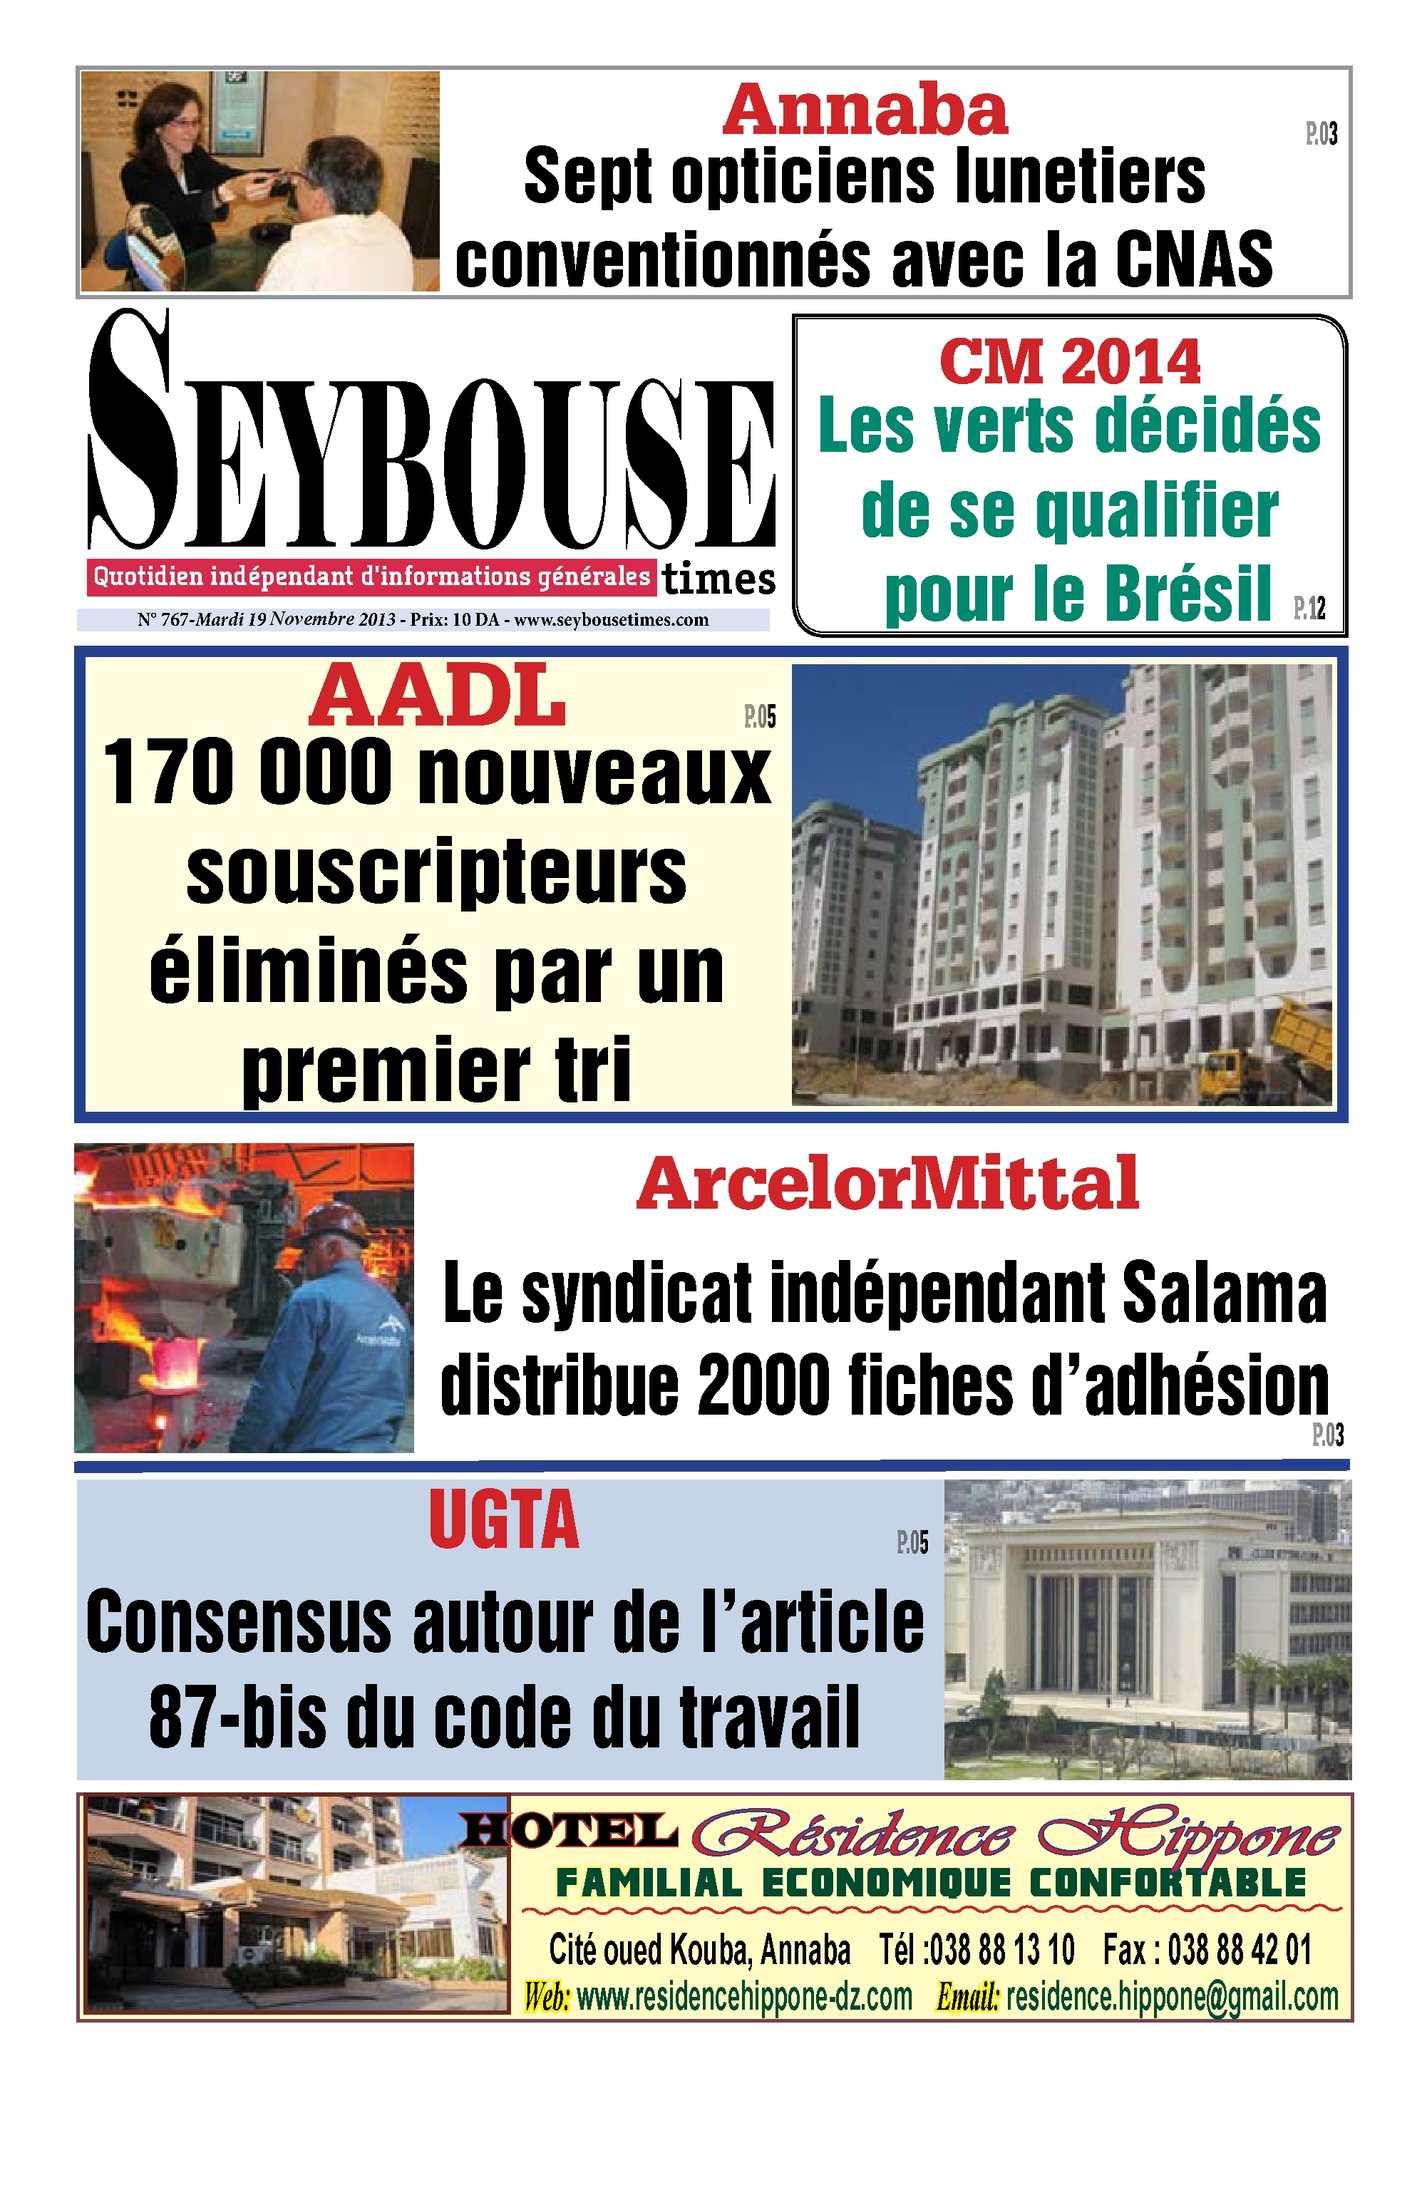 Calaméo - seybousetimes pdf E 767 6913840d94c1